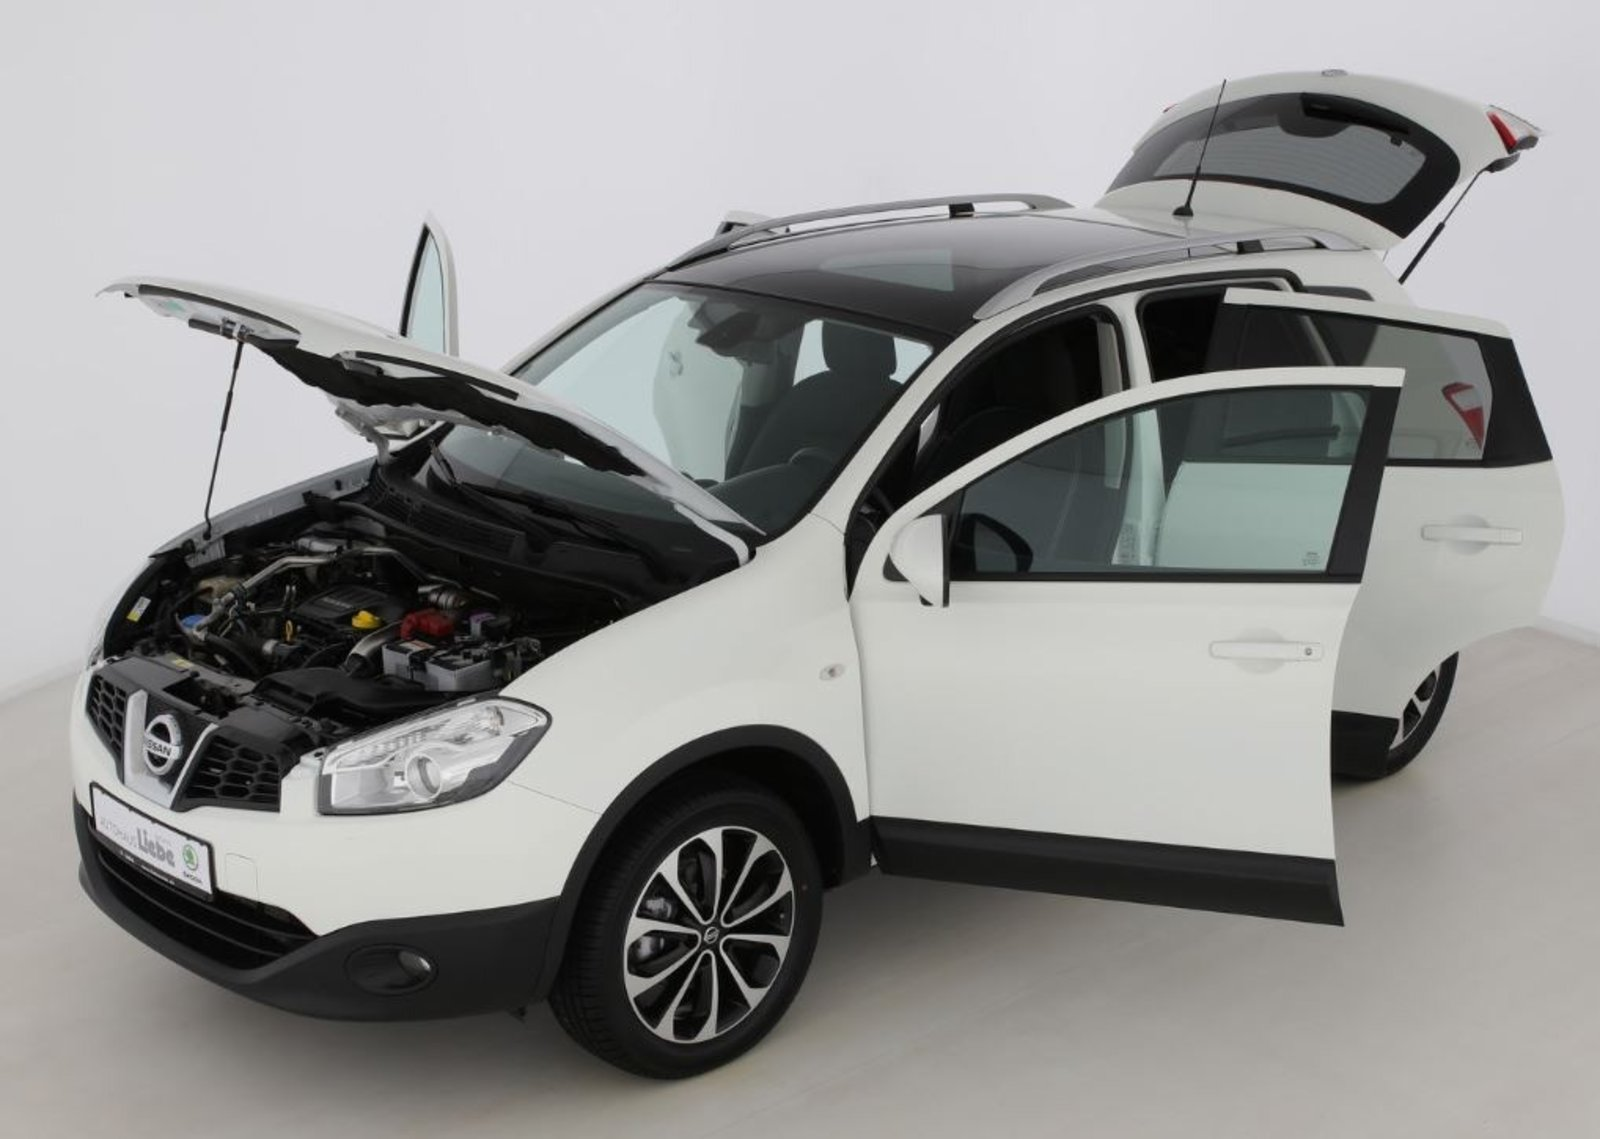 Nissan QASHQAI I-WAY 4X4 AREAVIEW|NAVI|TEMPOMAT|FREISPRECH, Jahr 2012, diesel